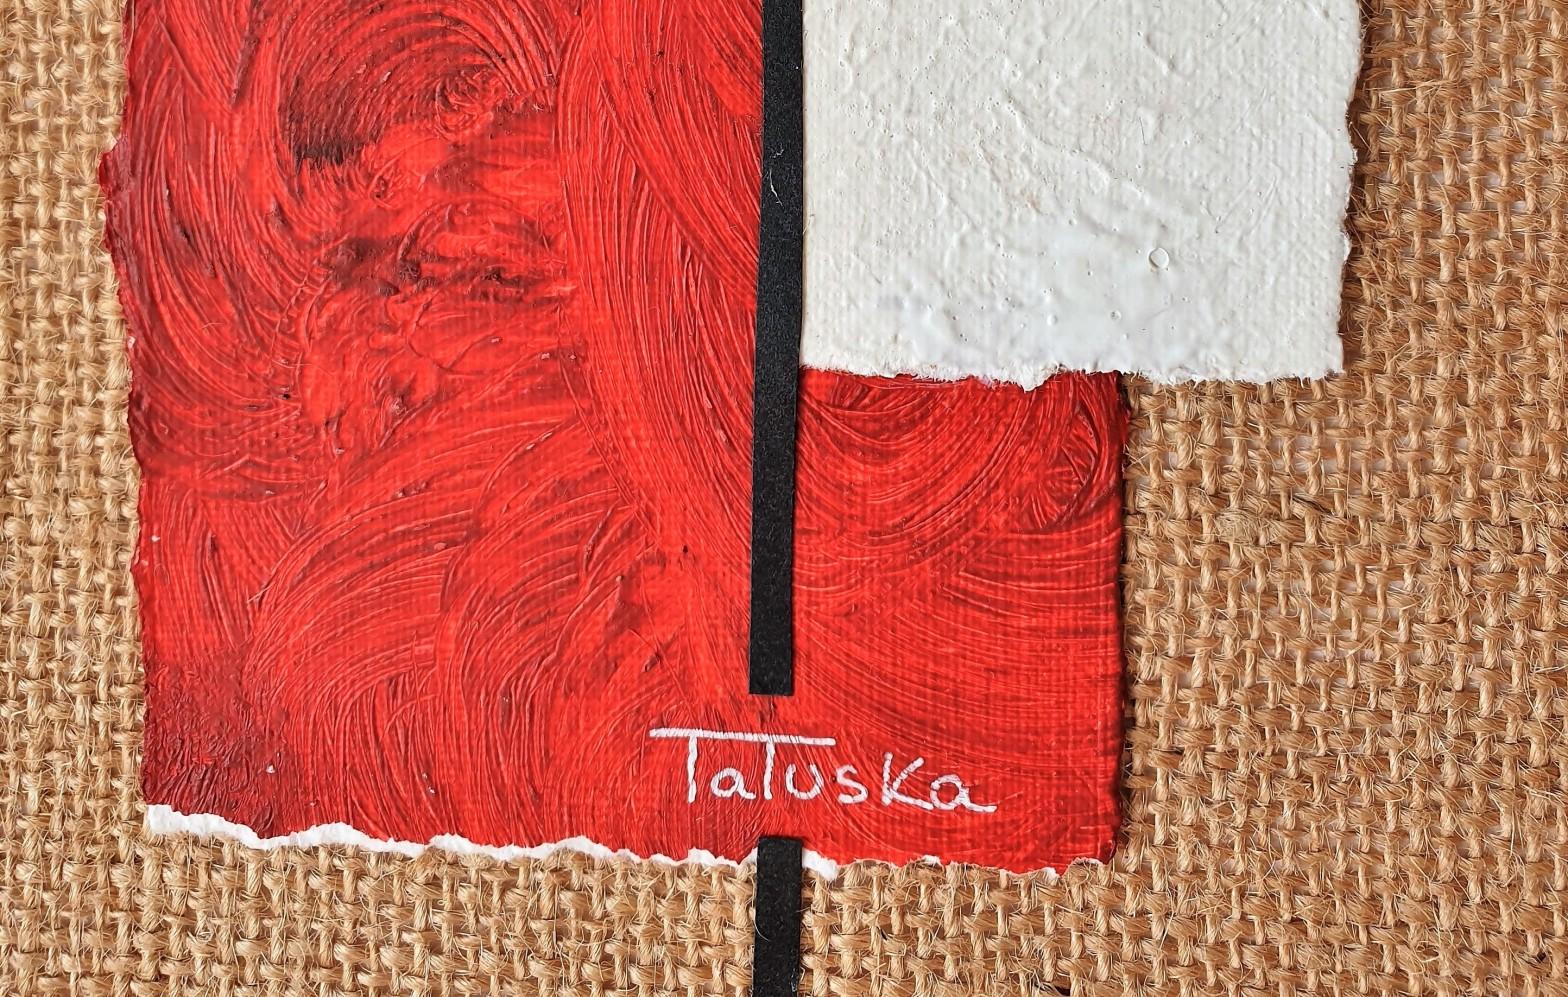 Firma personal de las obras de Tatuska